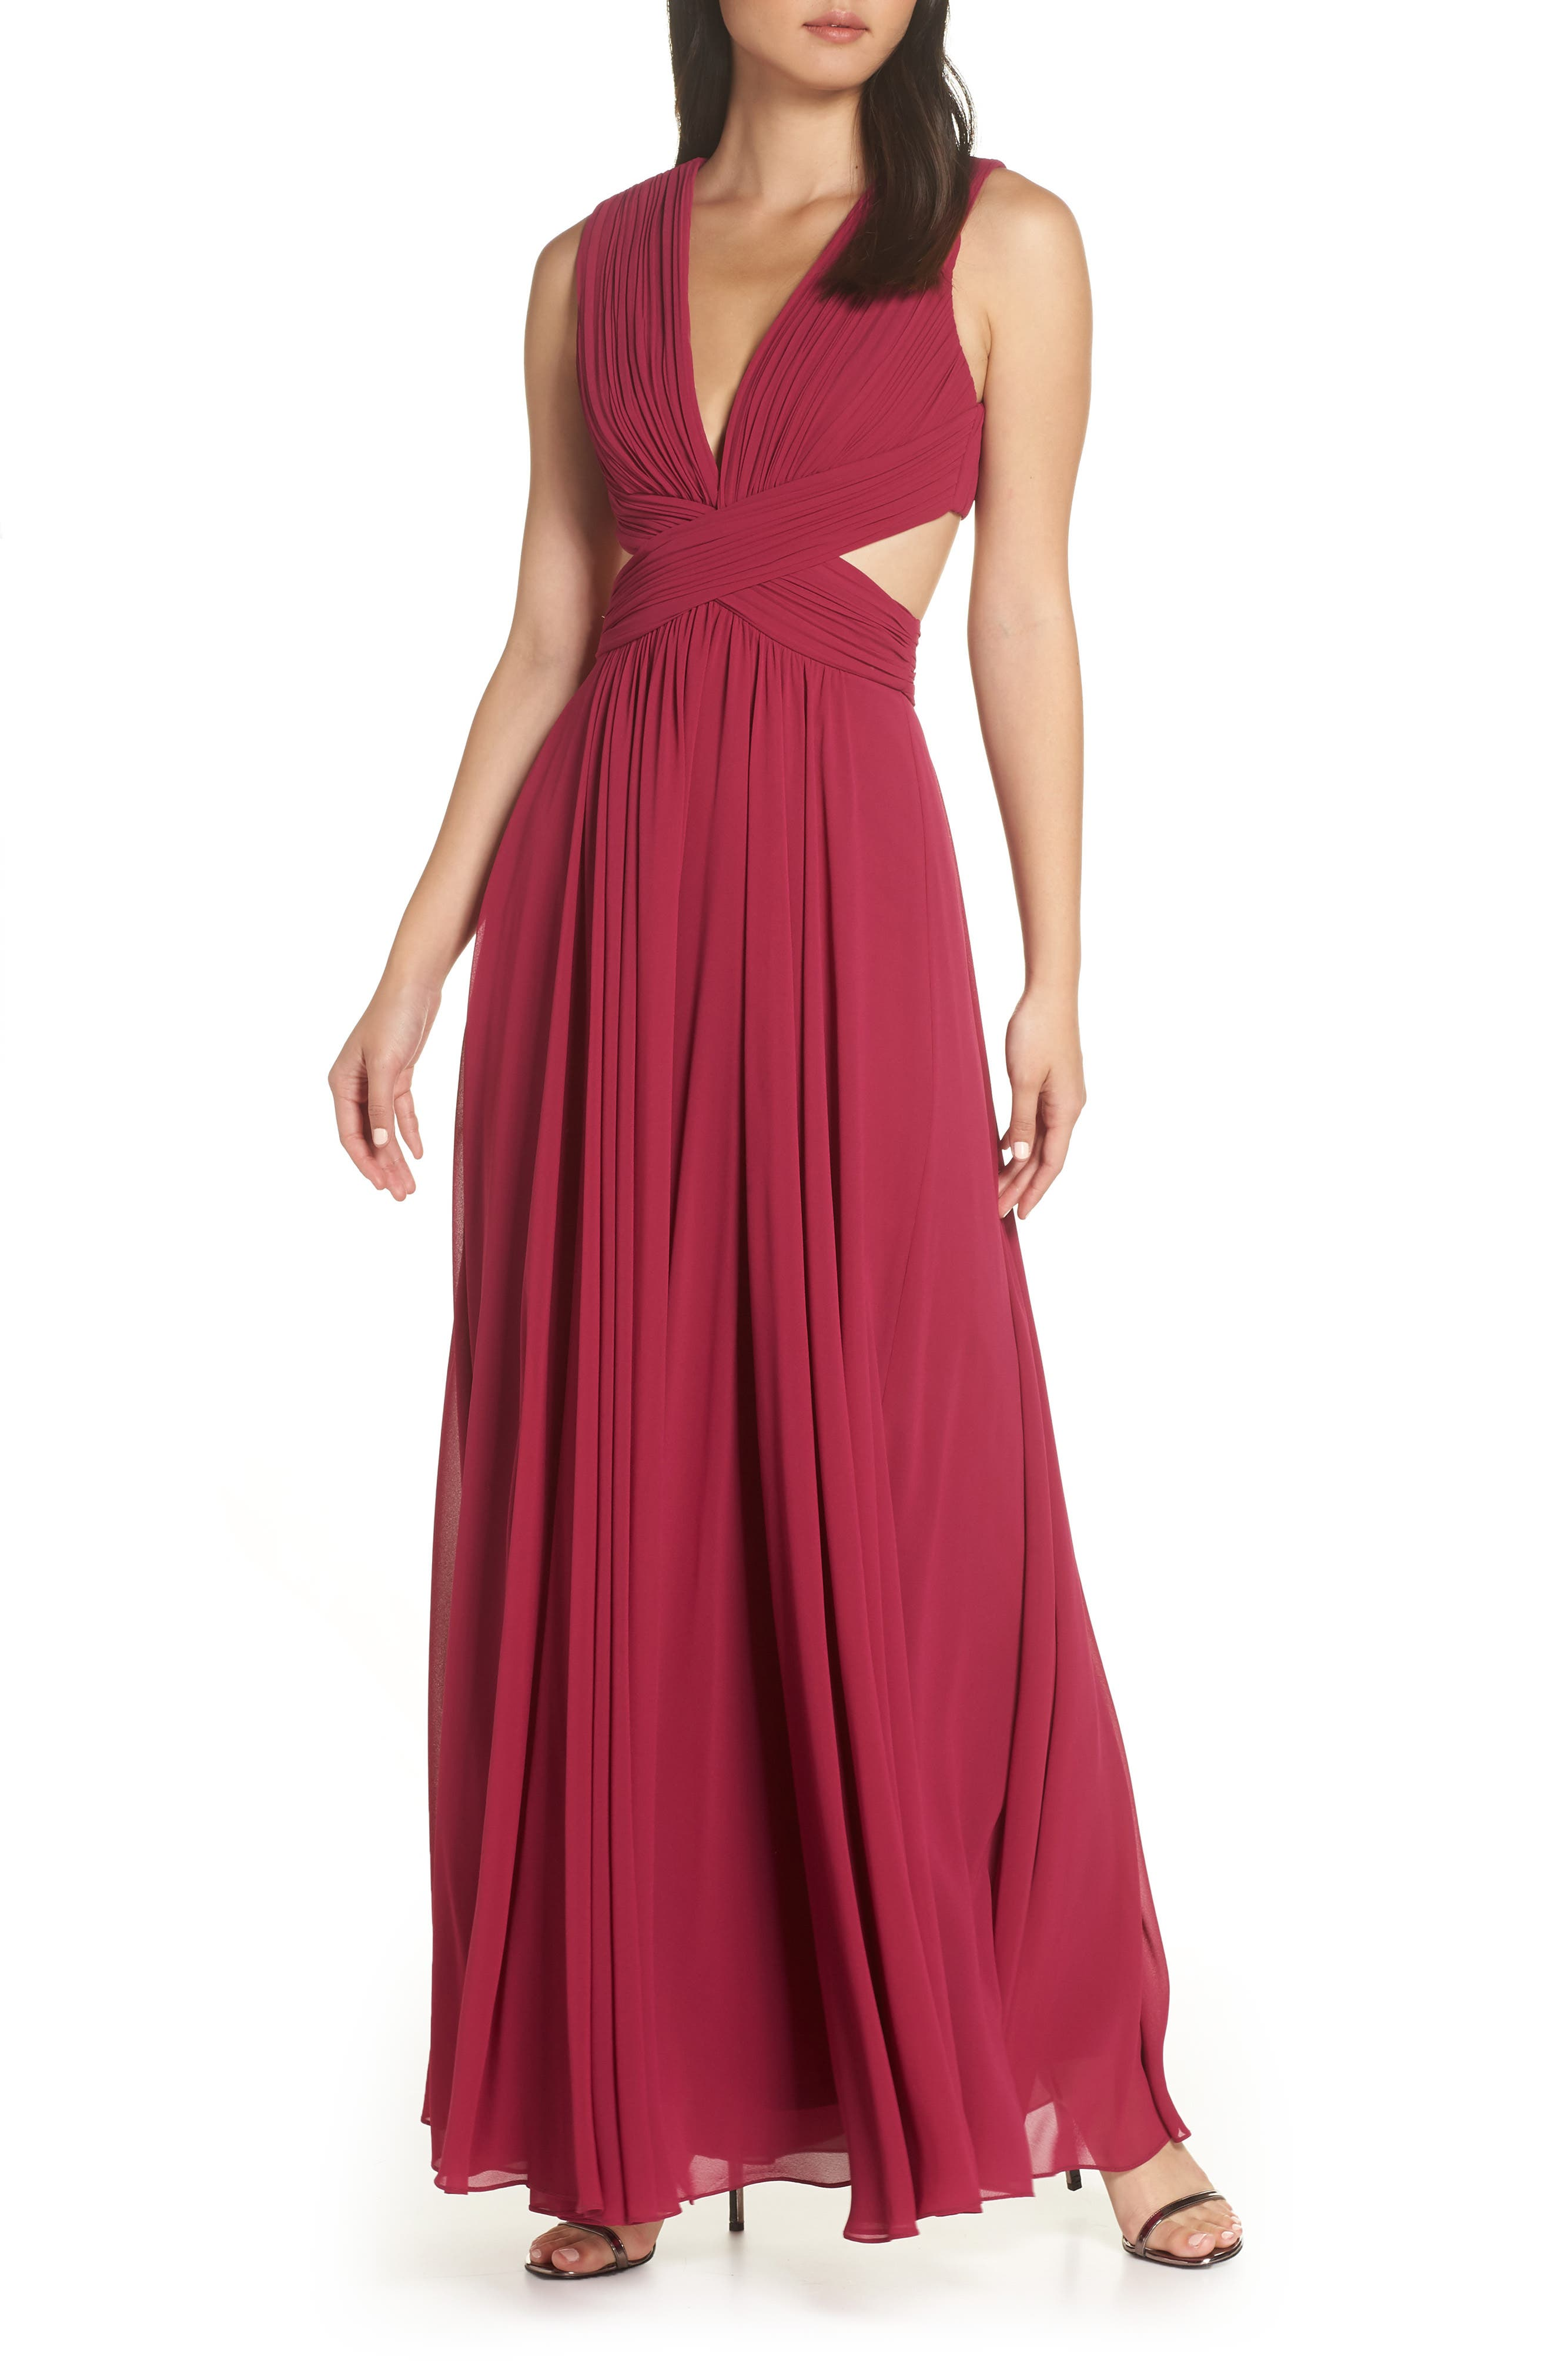 Lulus Vivid Imagination Chiffon Gown, Red